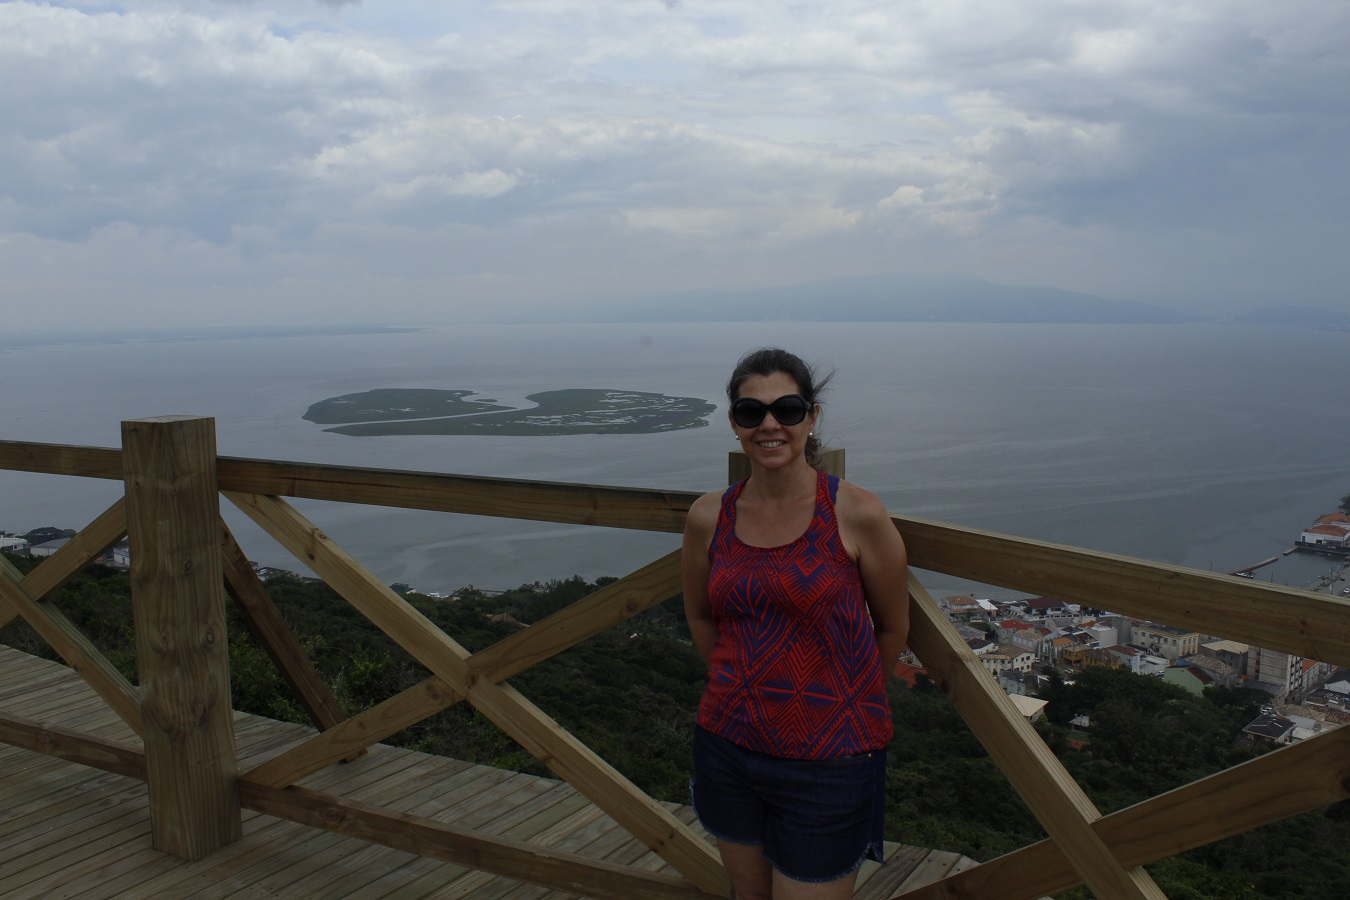 Laguna Santa Catarina Mirante da Glória